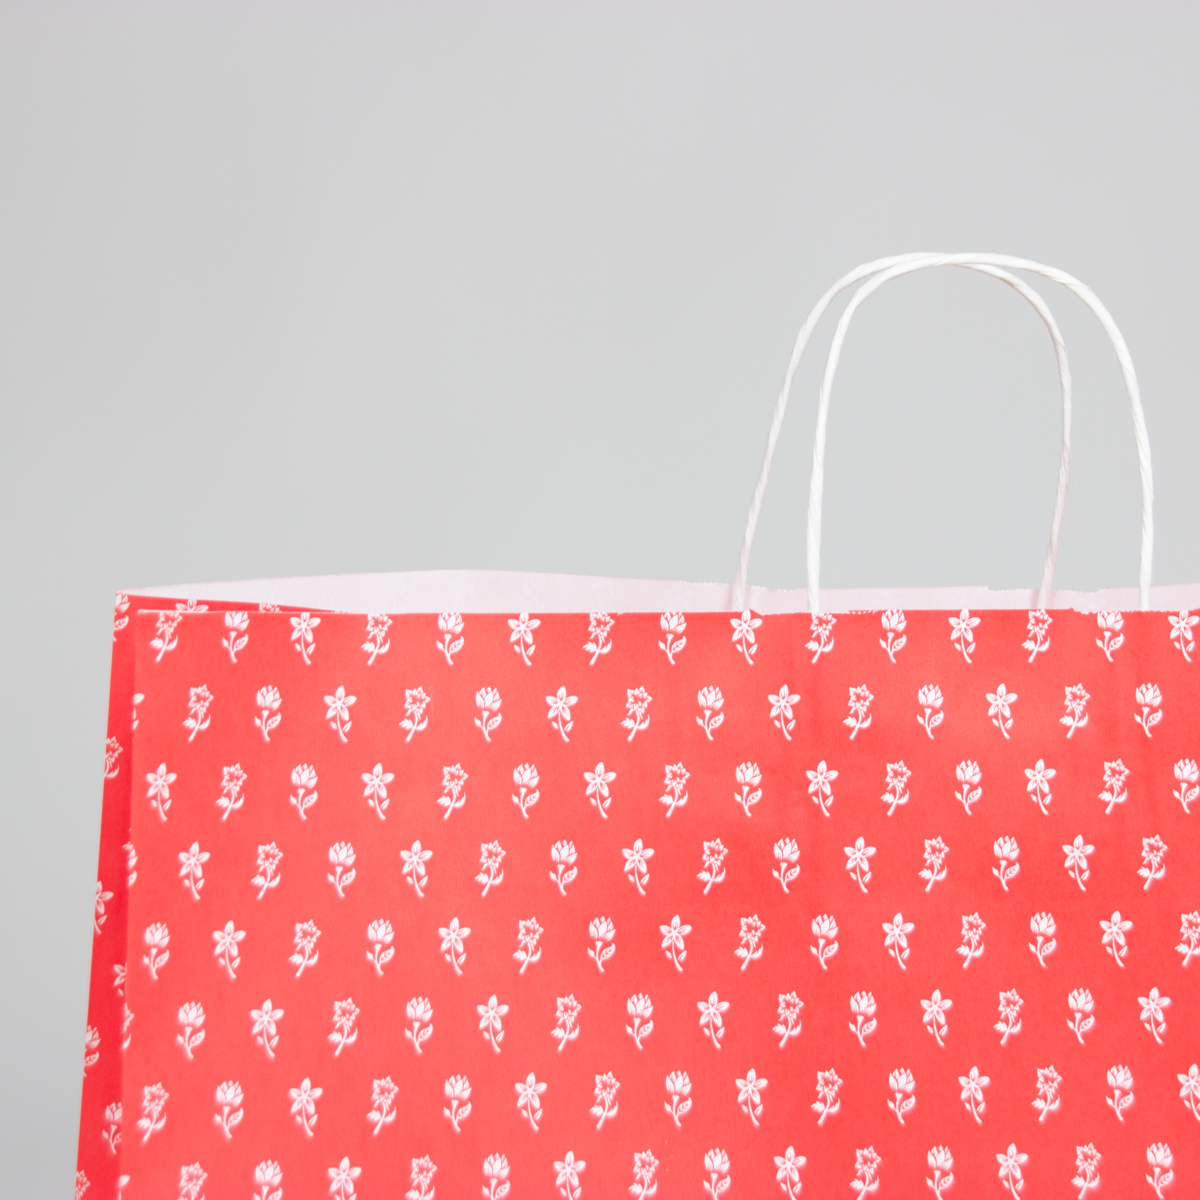 Twisted papieren tassen - Bloemen